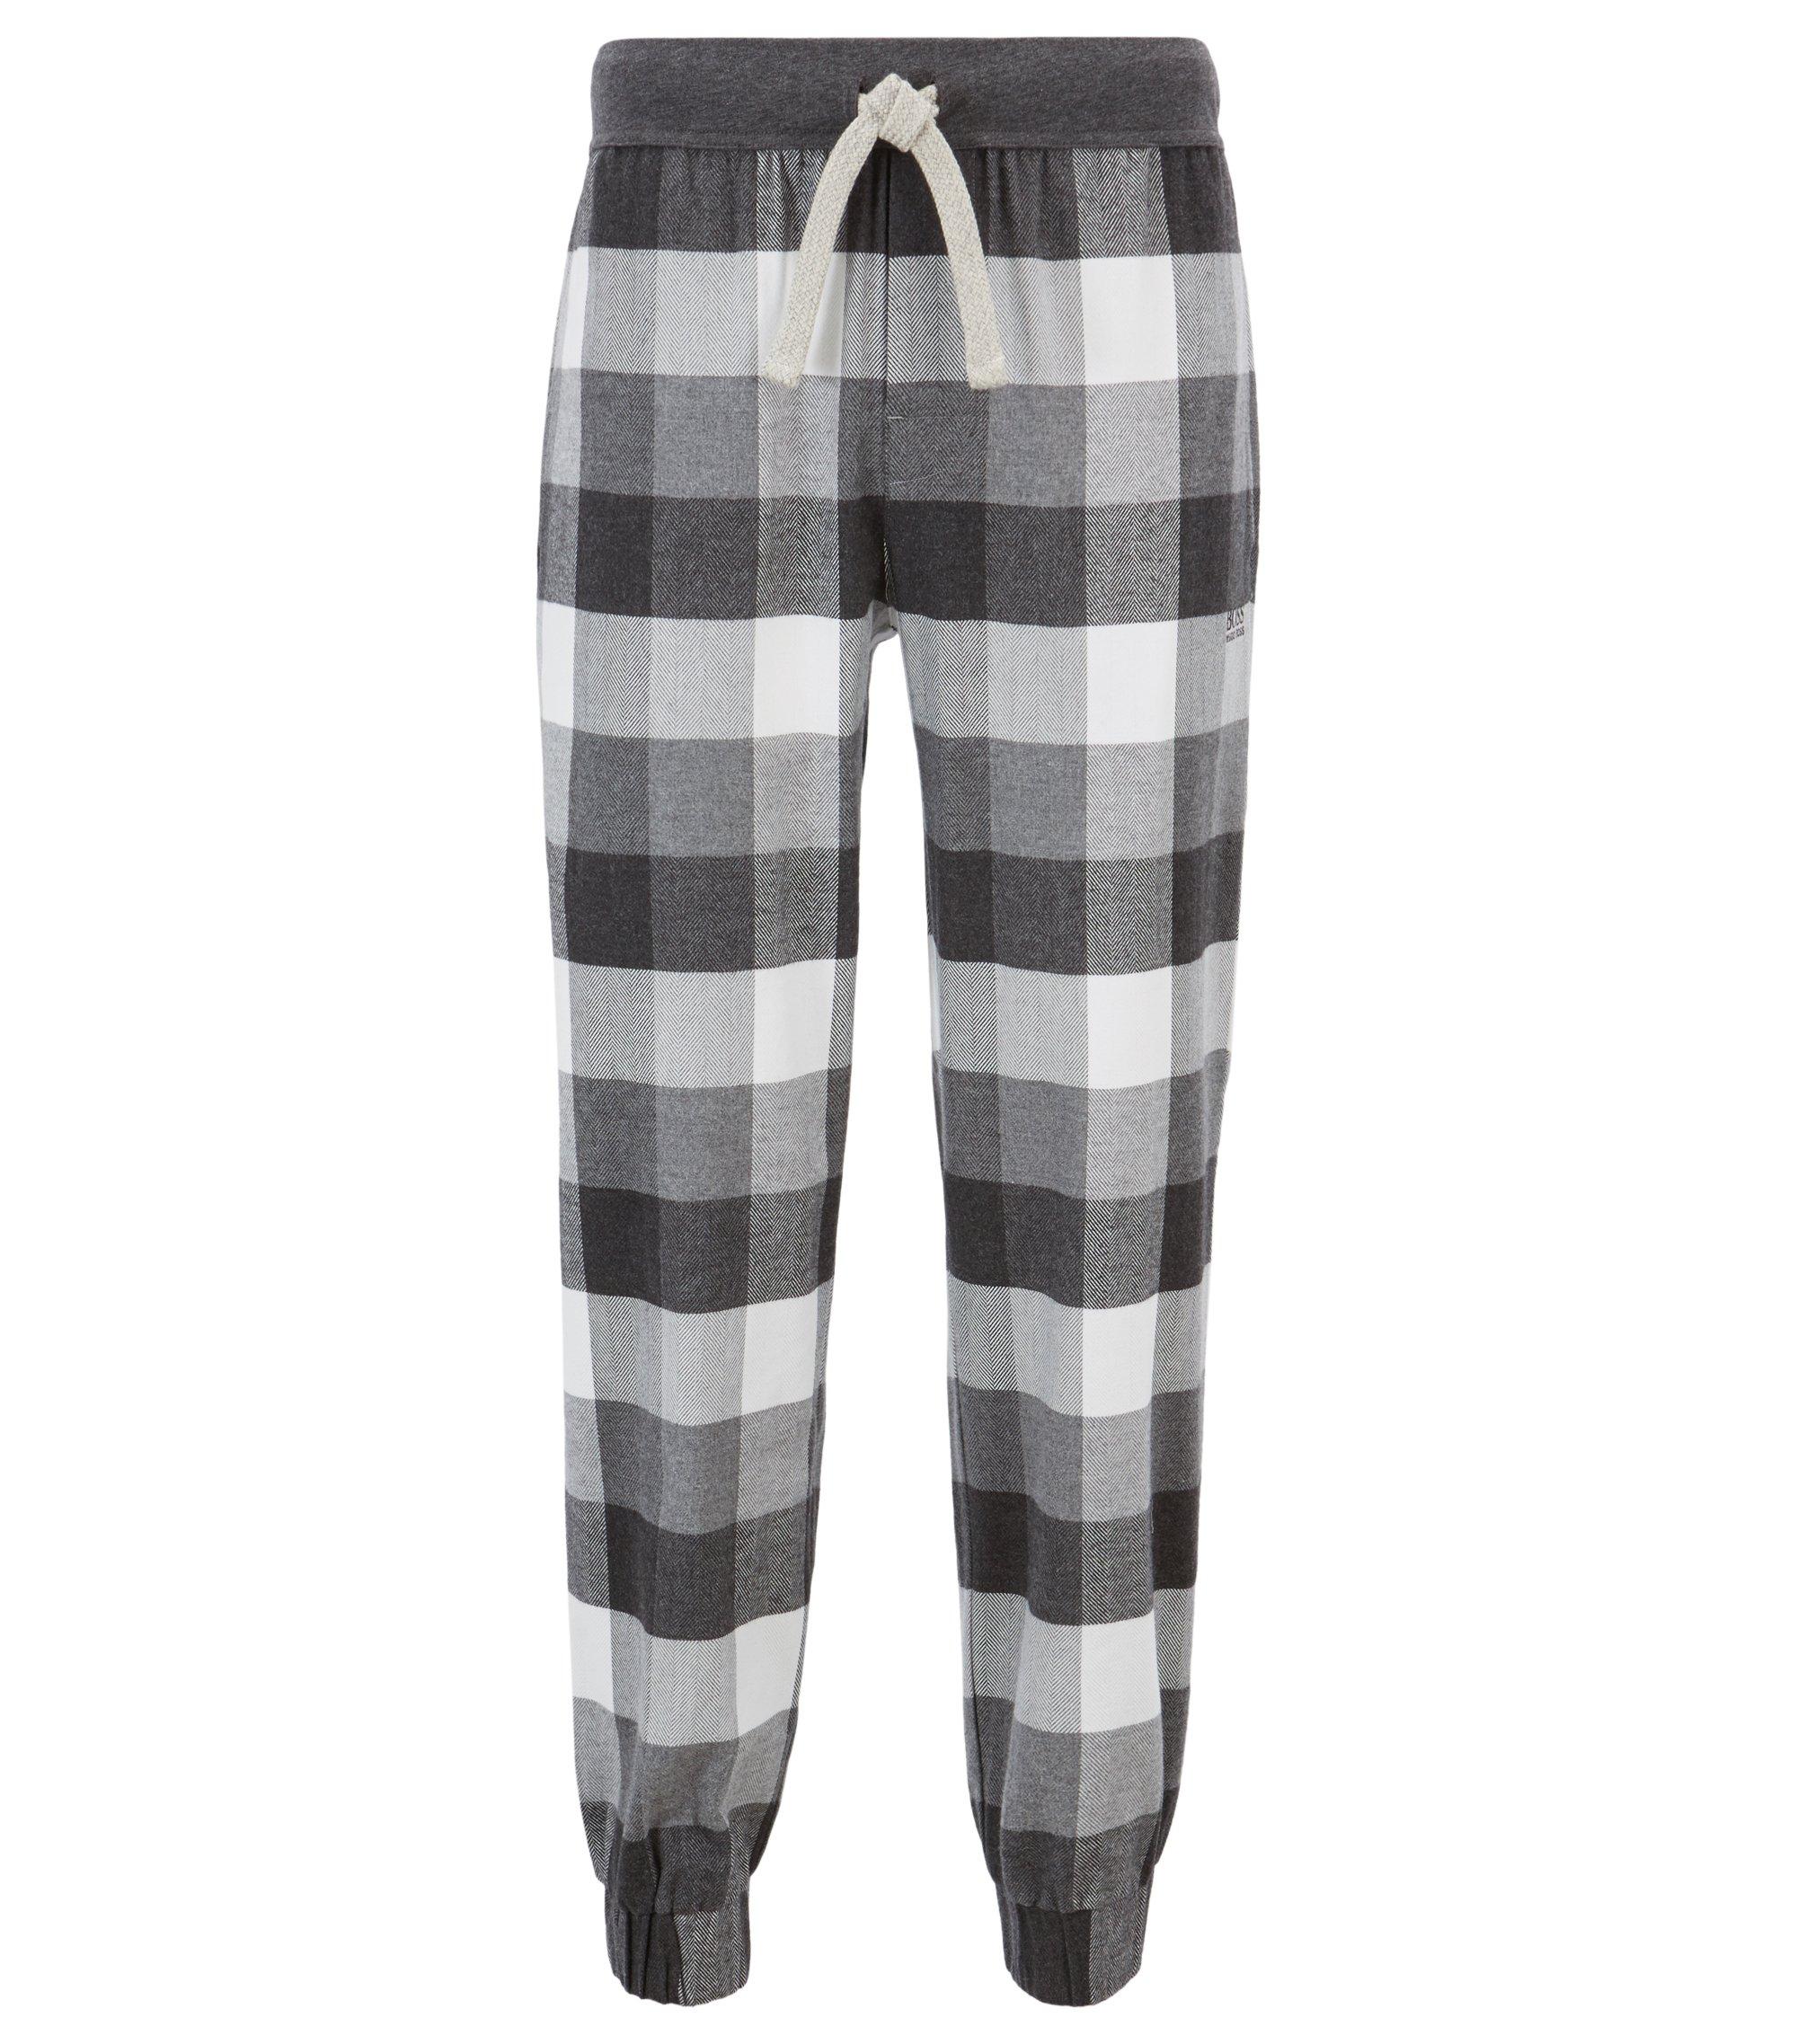 Pyjama-Hose aus weich angerautem Flanell mit kontrastfarbenem Tunnelzug, Grau